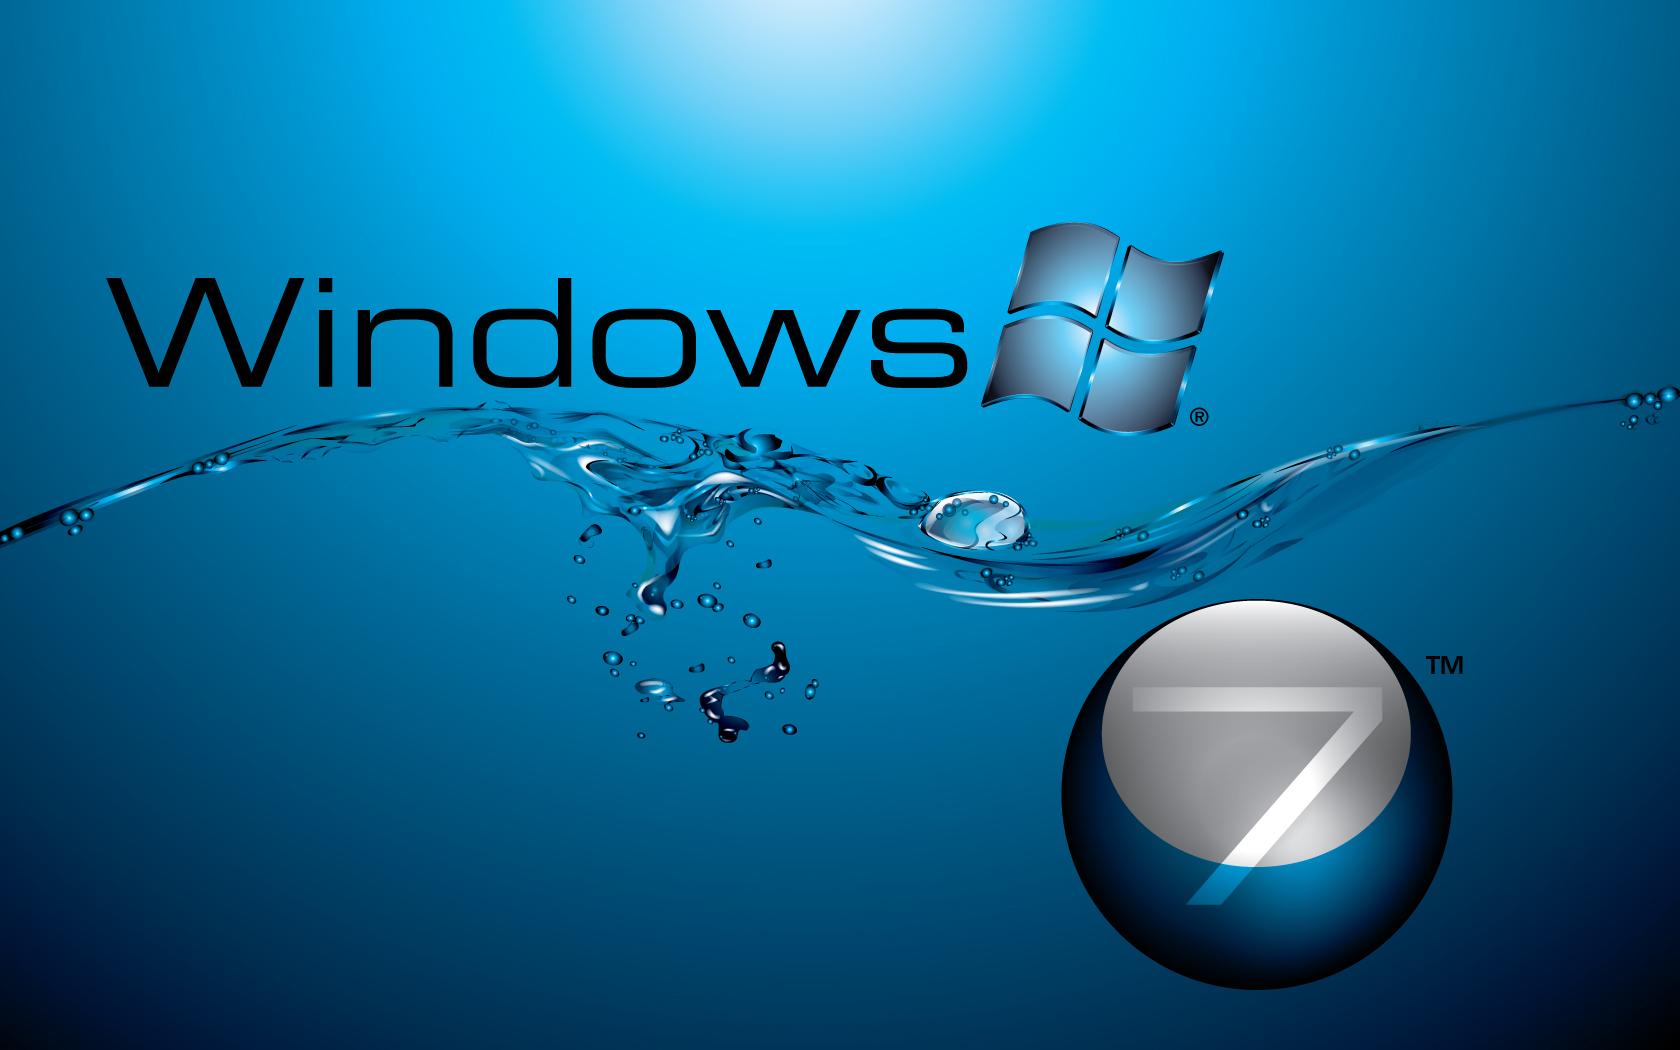 Windows 7 in Water Flow Wallpapers HD Wallpapers 1680x1050